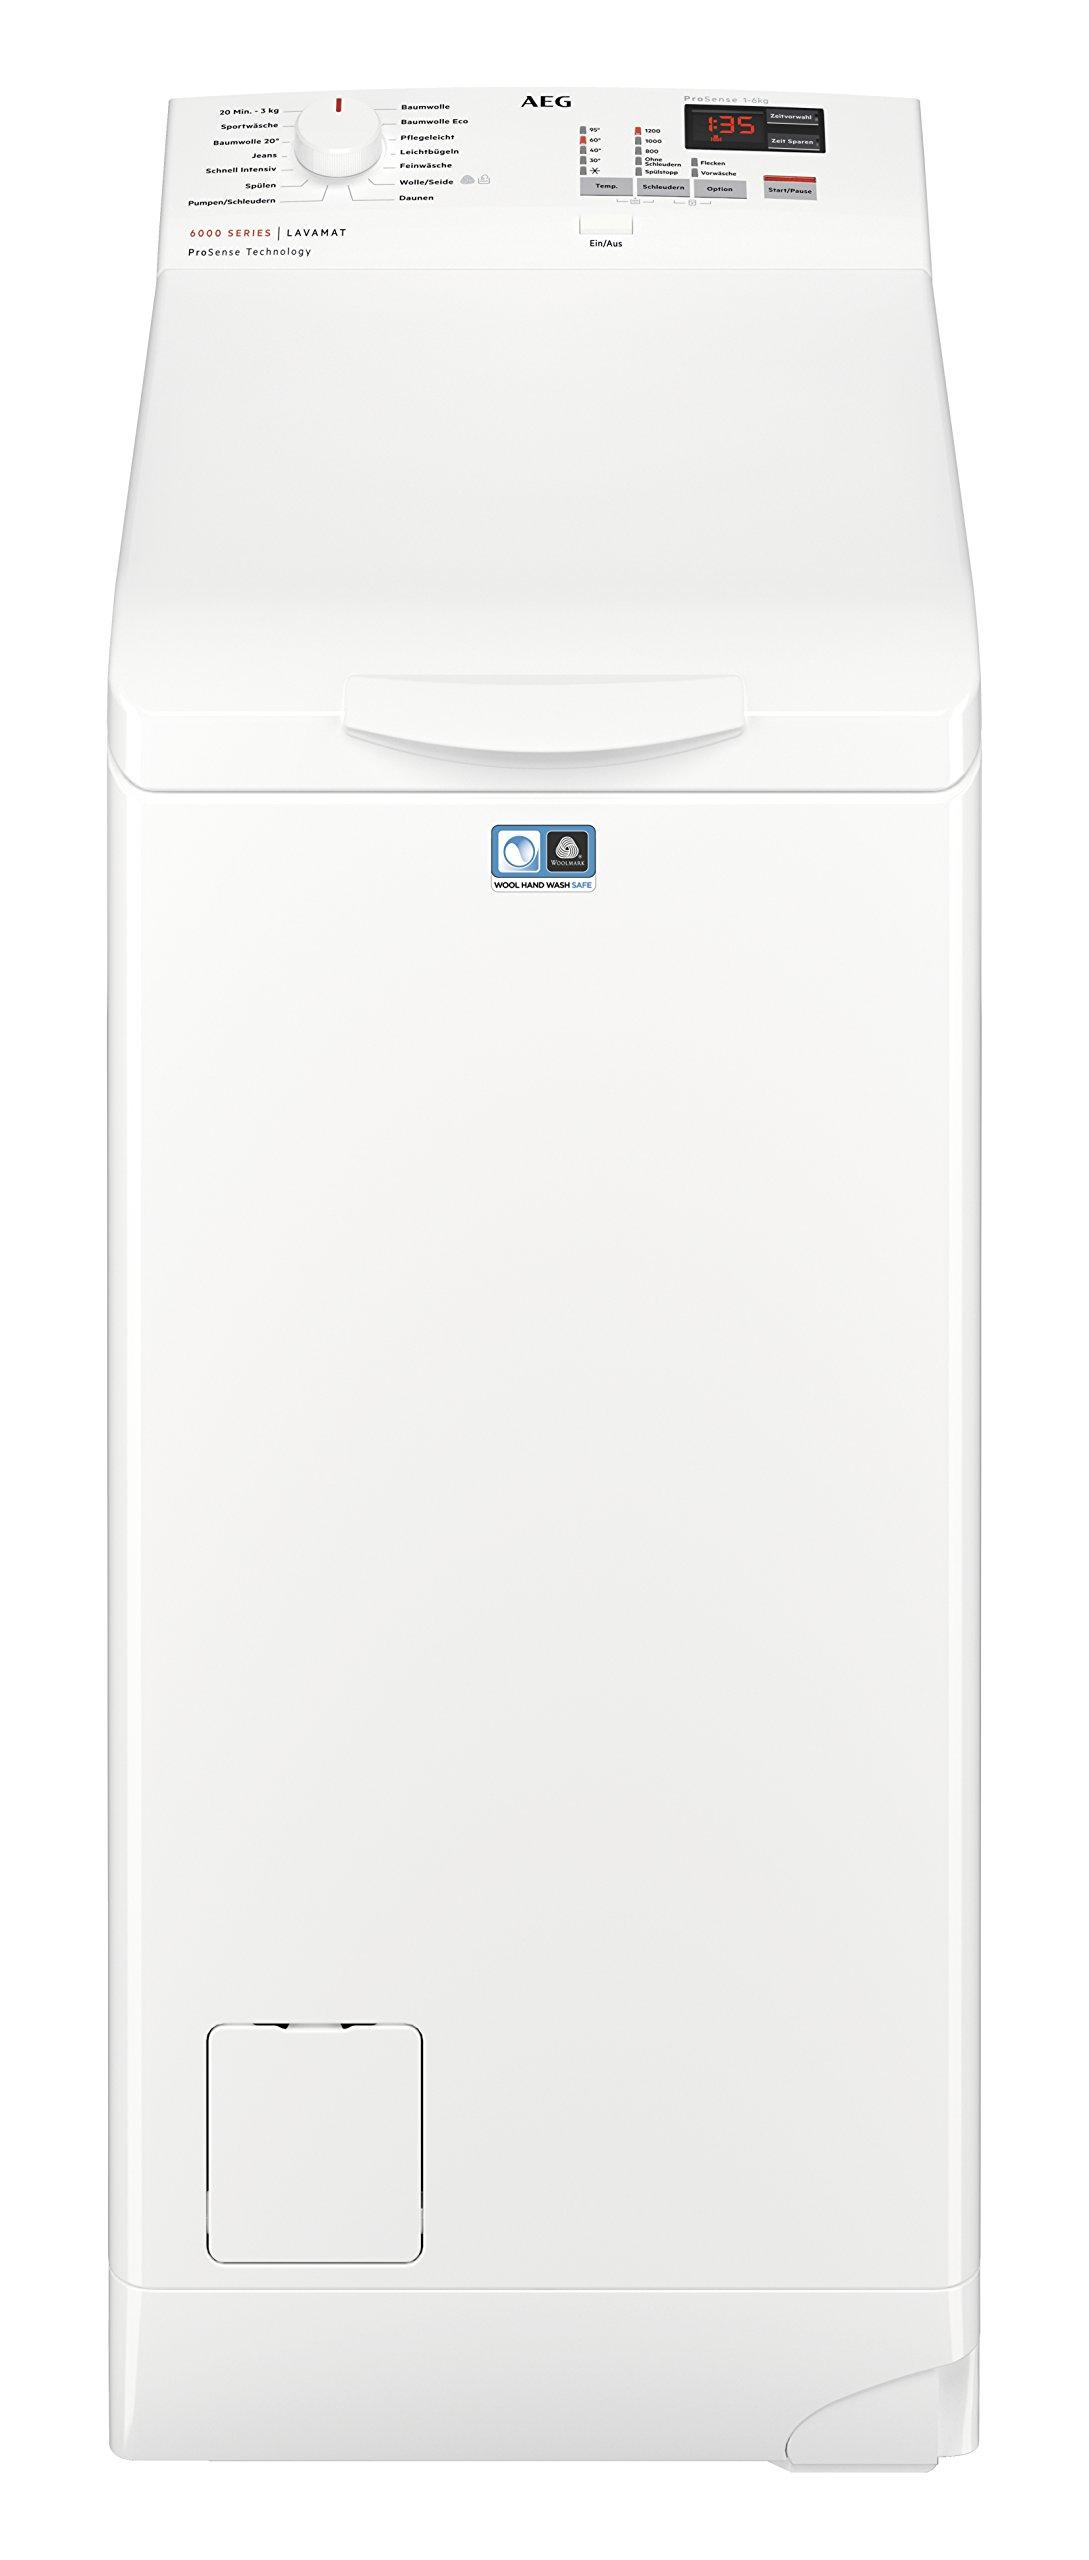 AEG L6TB40260 Waschmaschine Toplader, 6,0 kg, Mengenautomatik, Nachlegefunktion